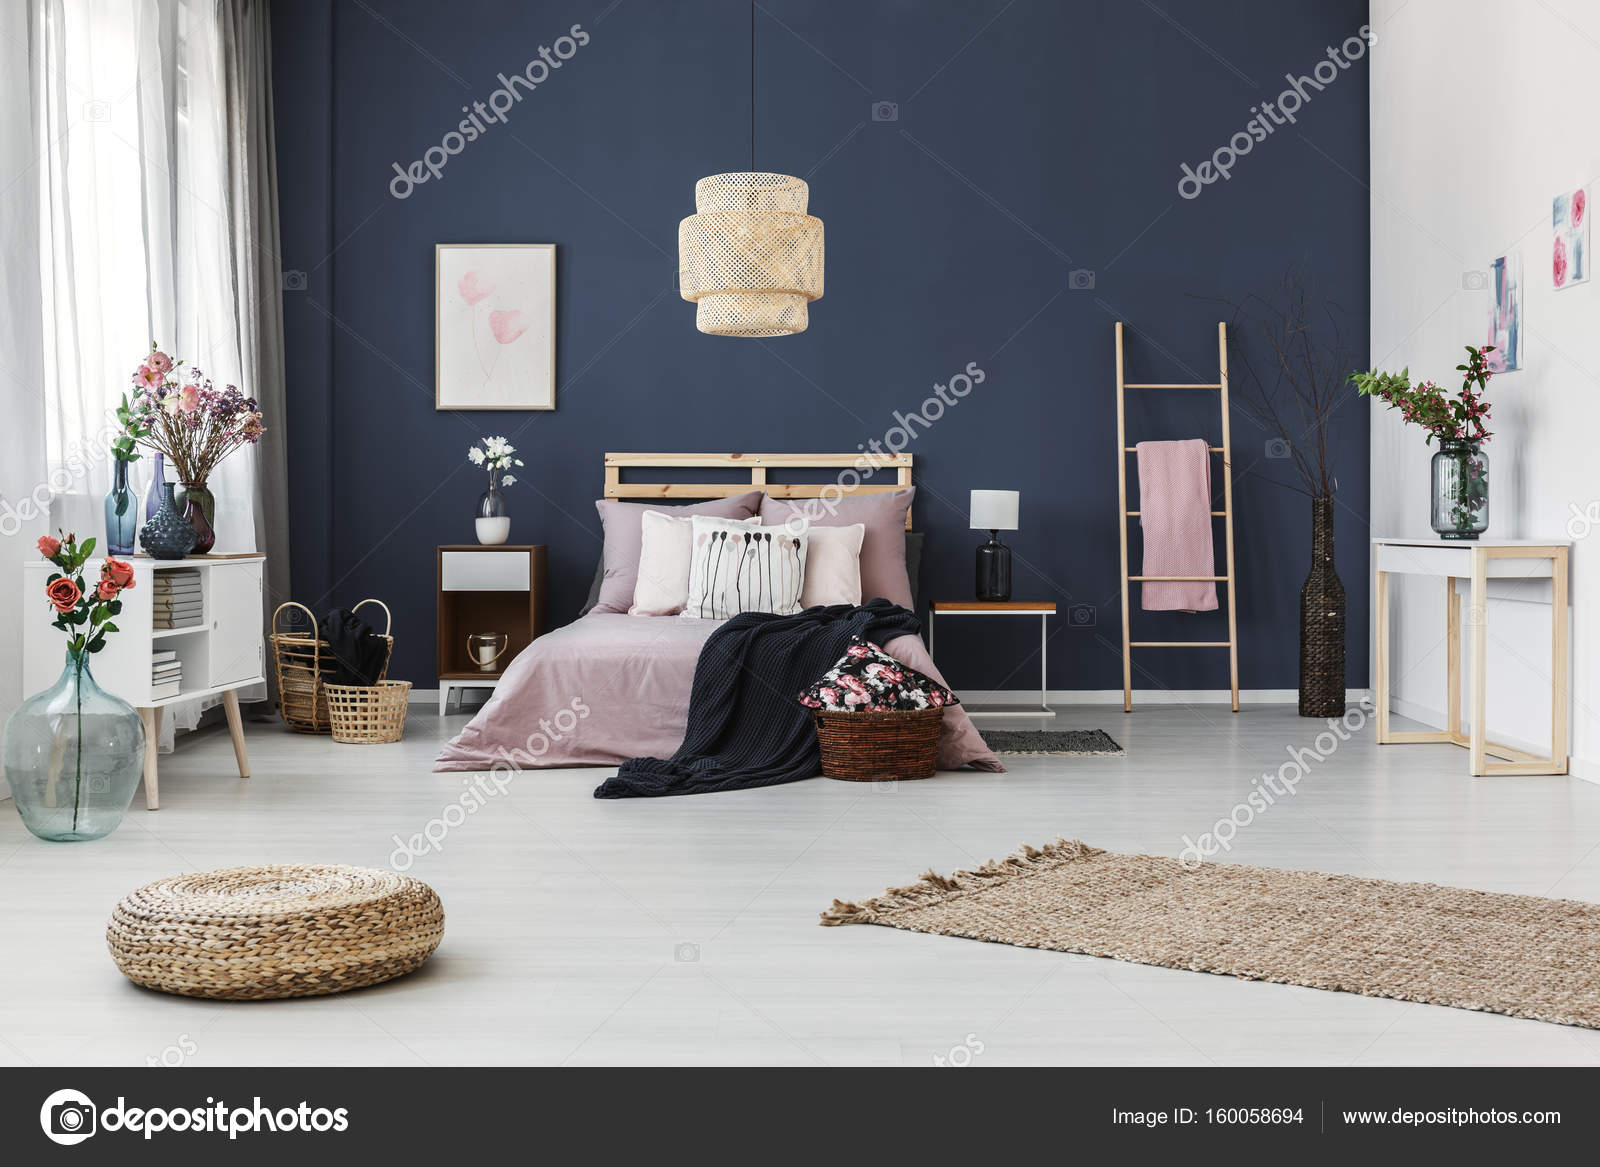 Slaapkamer Blauwe Muur : Donker blauwe muur in de slaapkamer u stockfoto photographee eu